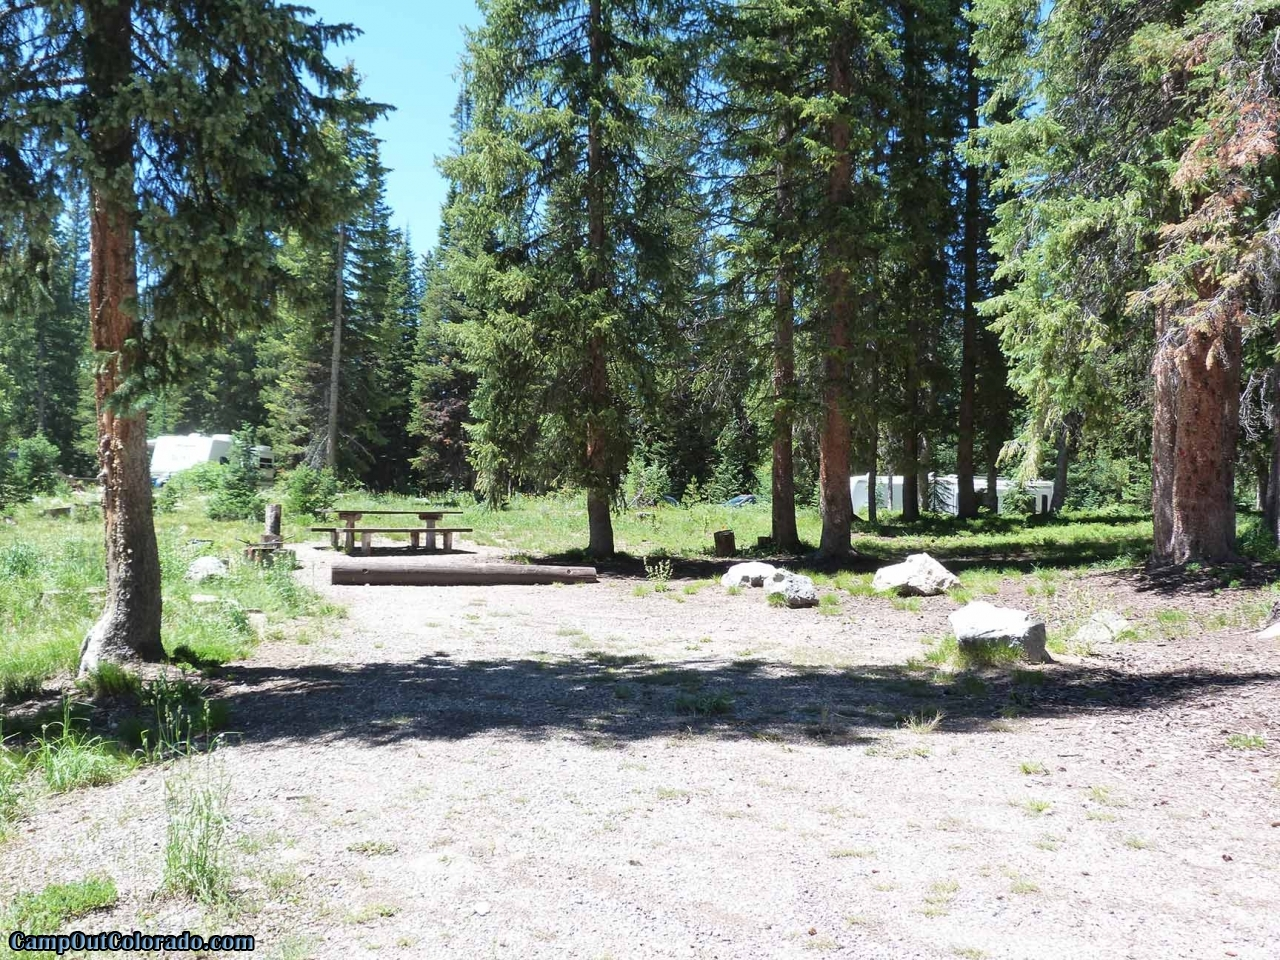 campoutcolorado-meadows-campground-rabbit-ears-campsite